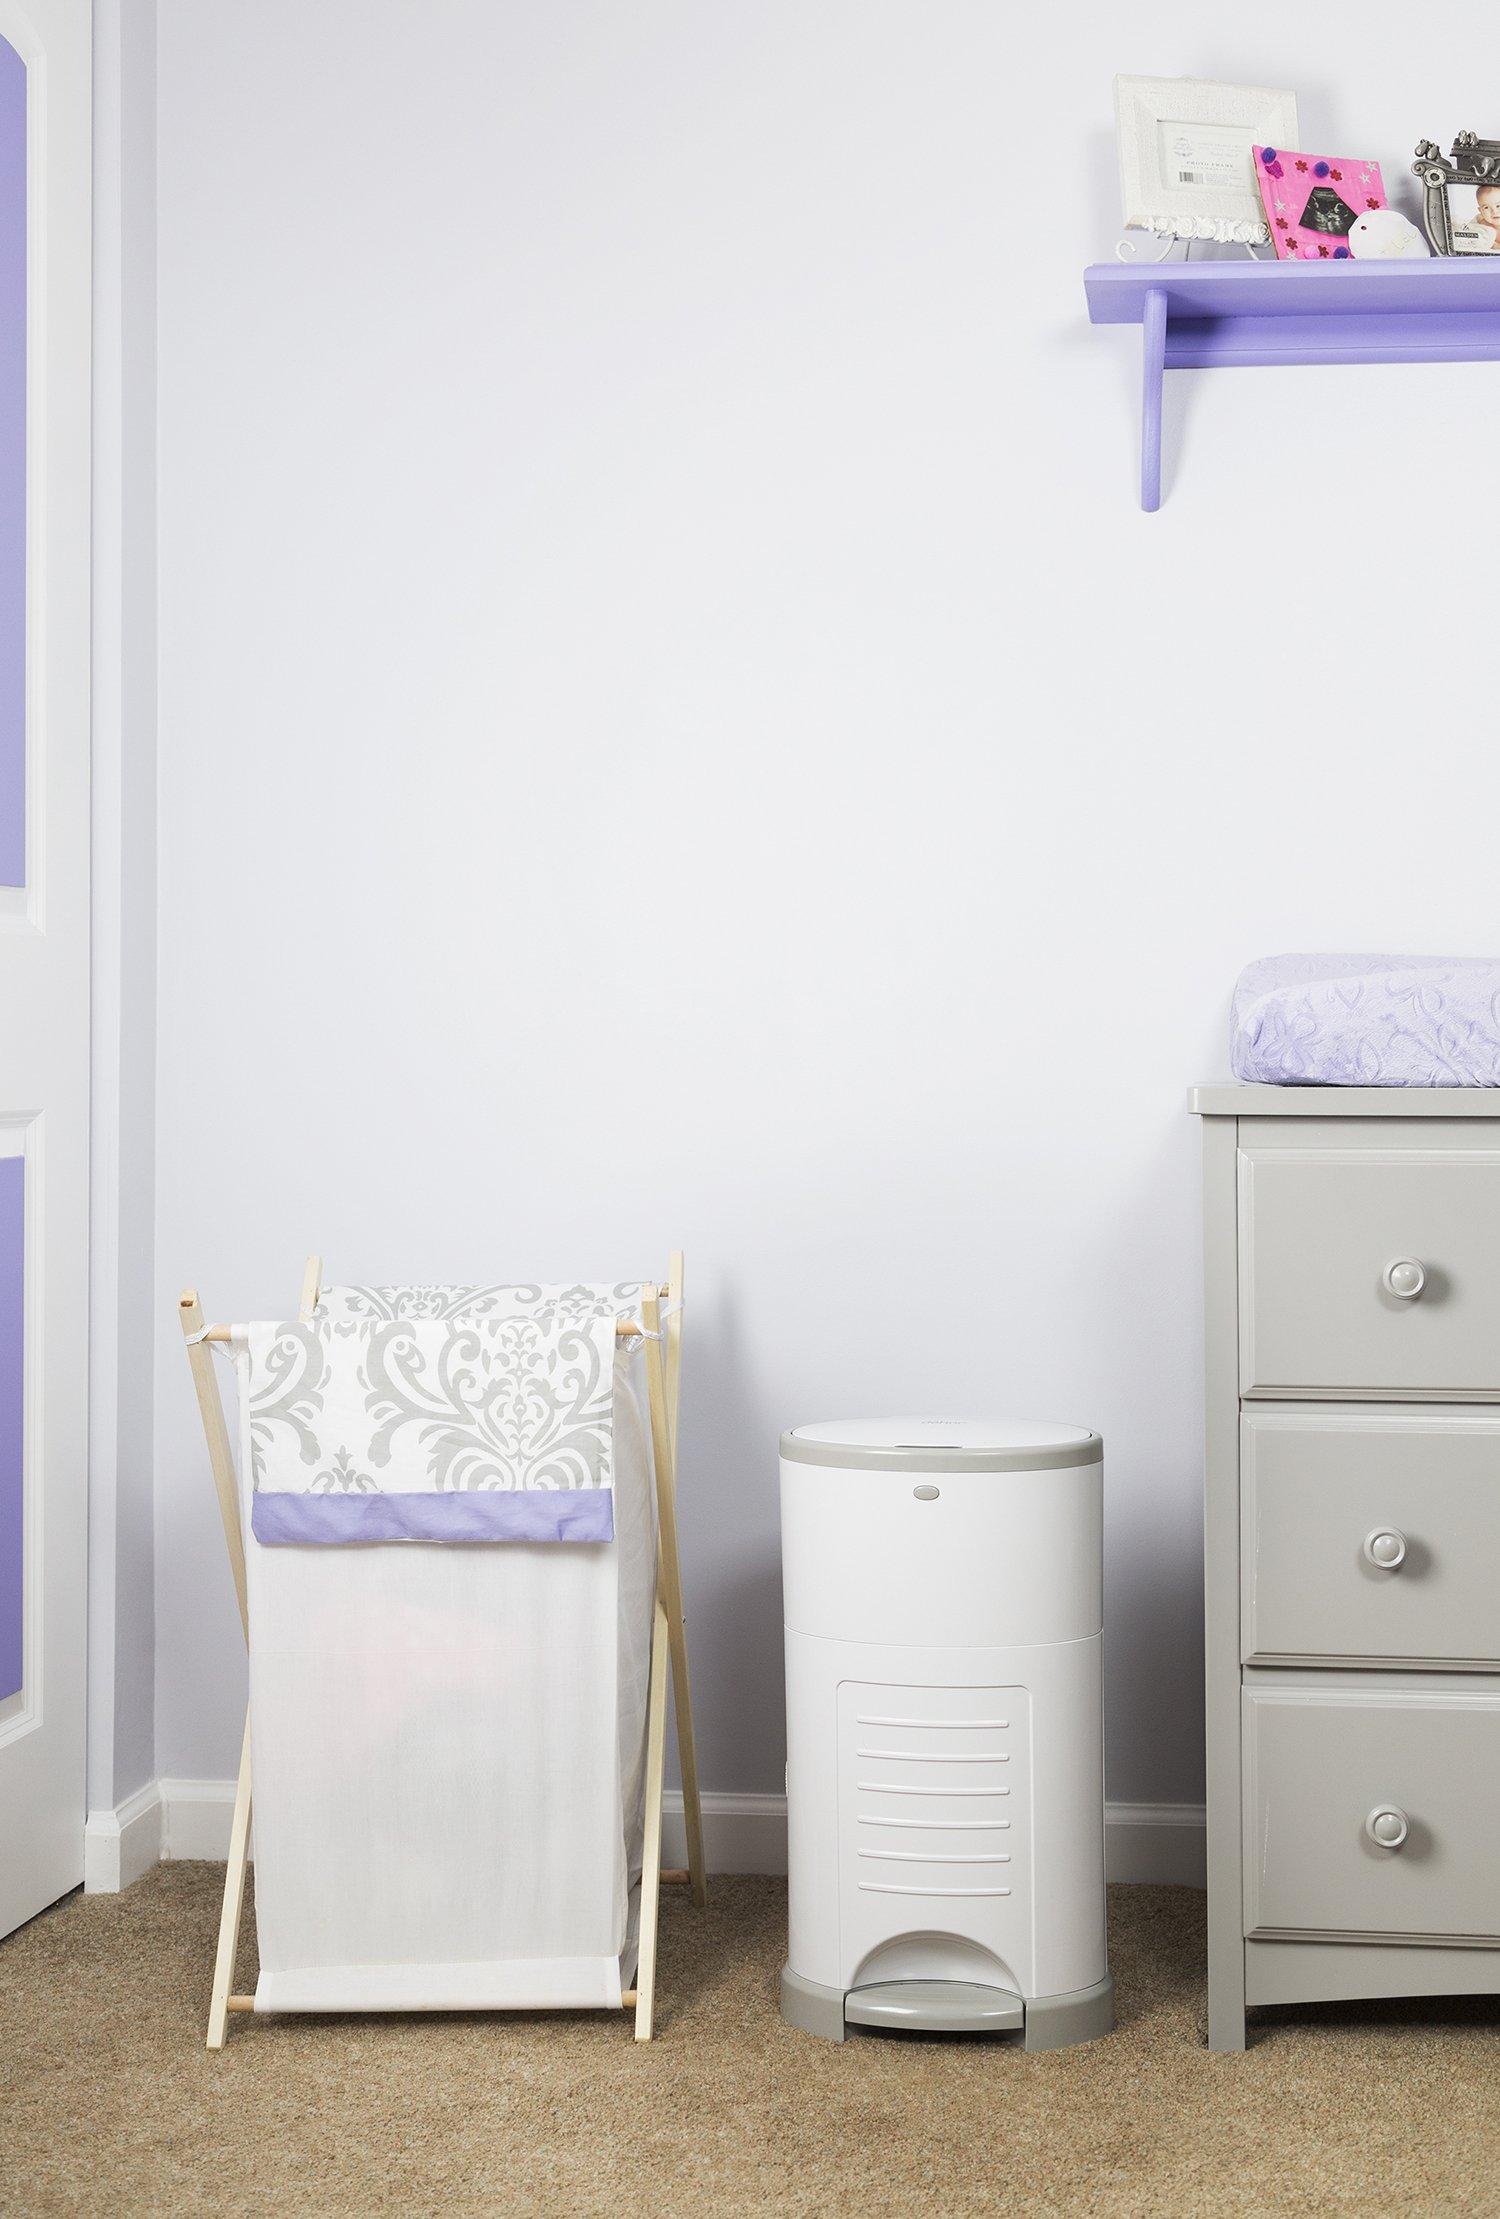 Dekor classic hands free diaper pail easiest to use for Dekor classic diaper pail refills